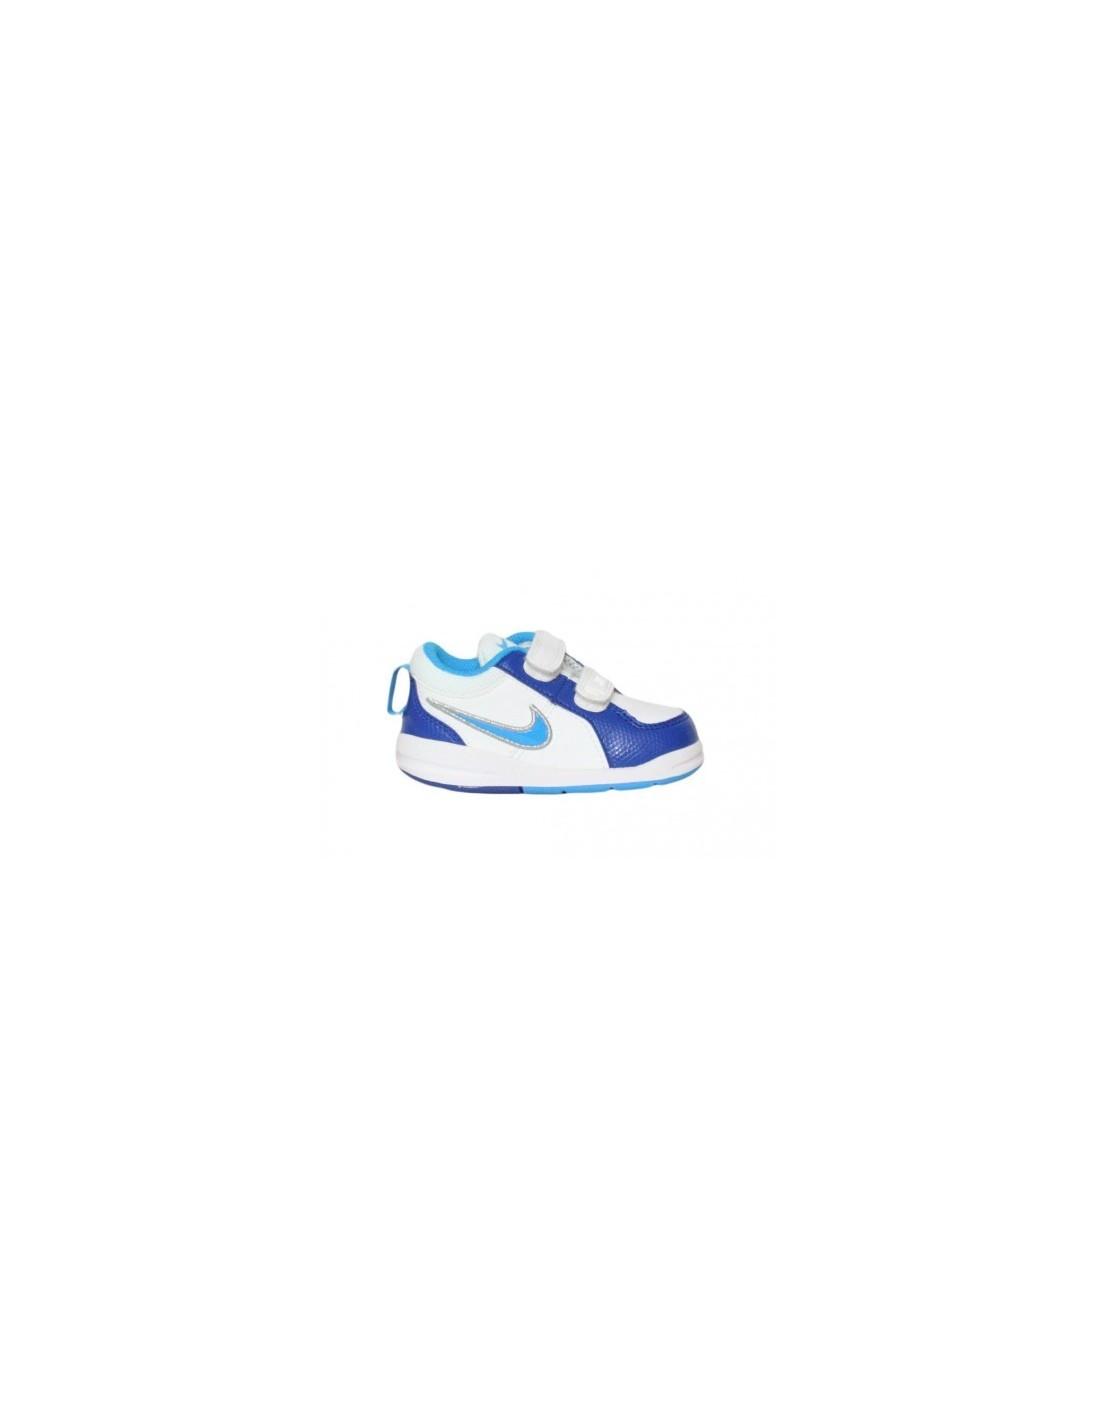 Bambino Dwe2yhi9be Blu 4 Tdv Da Scarpe Nike Pico tsdxrohCBQ